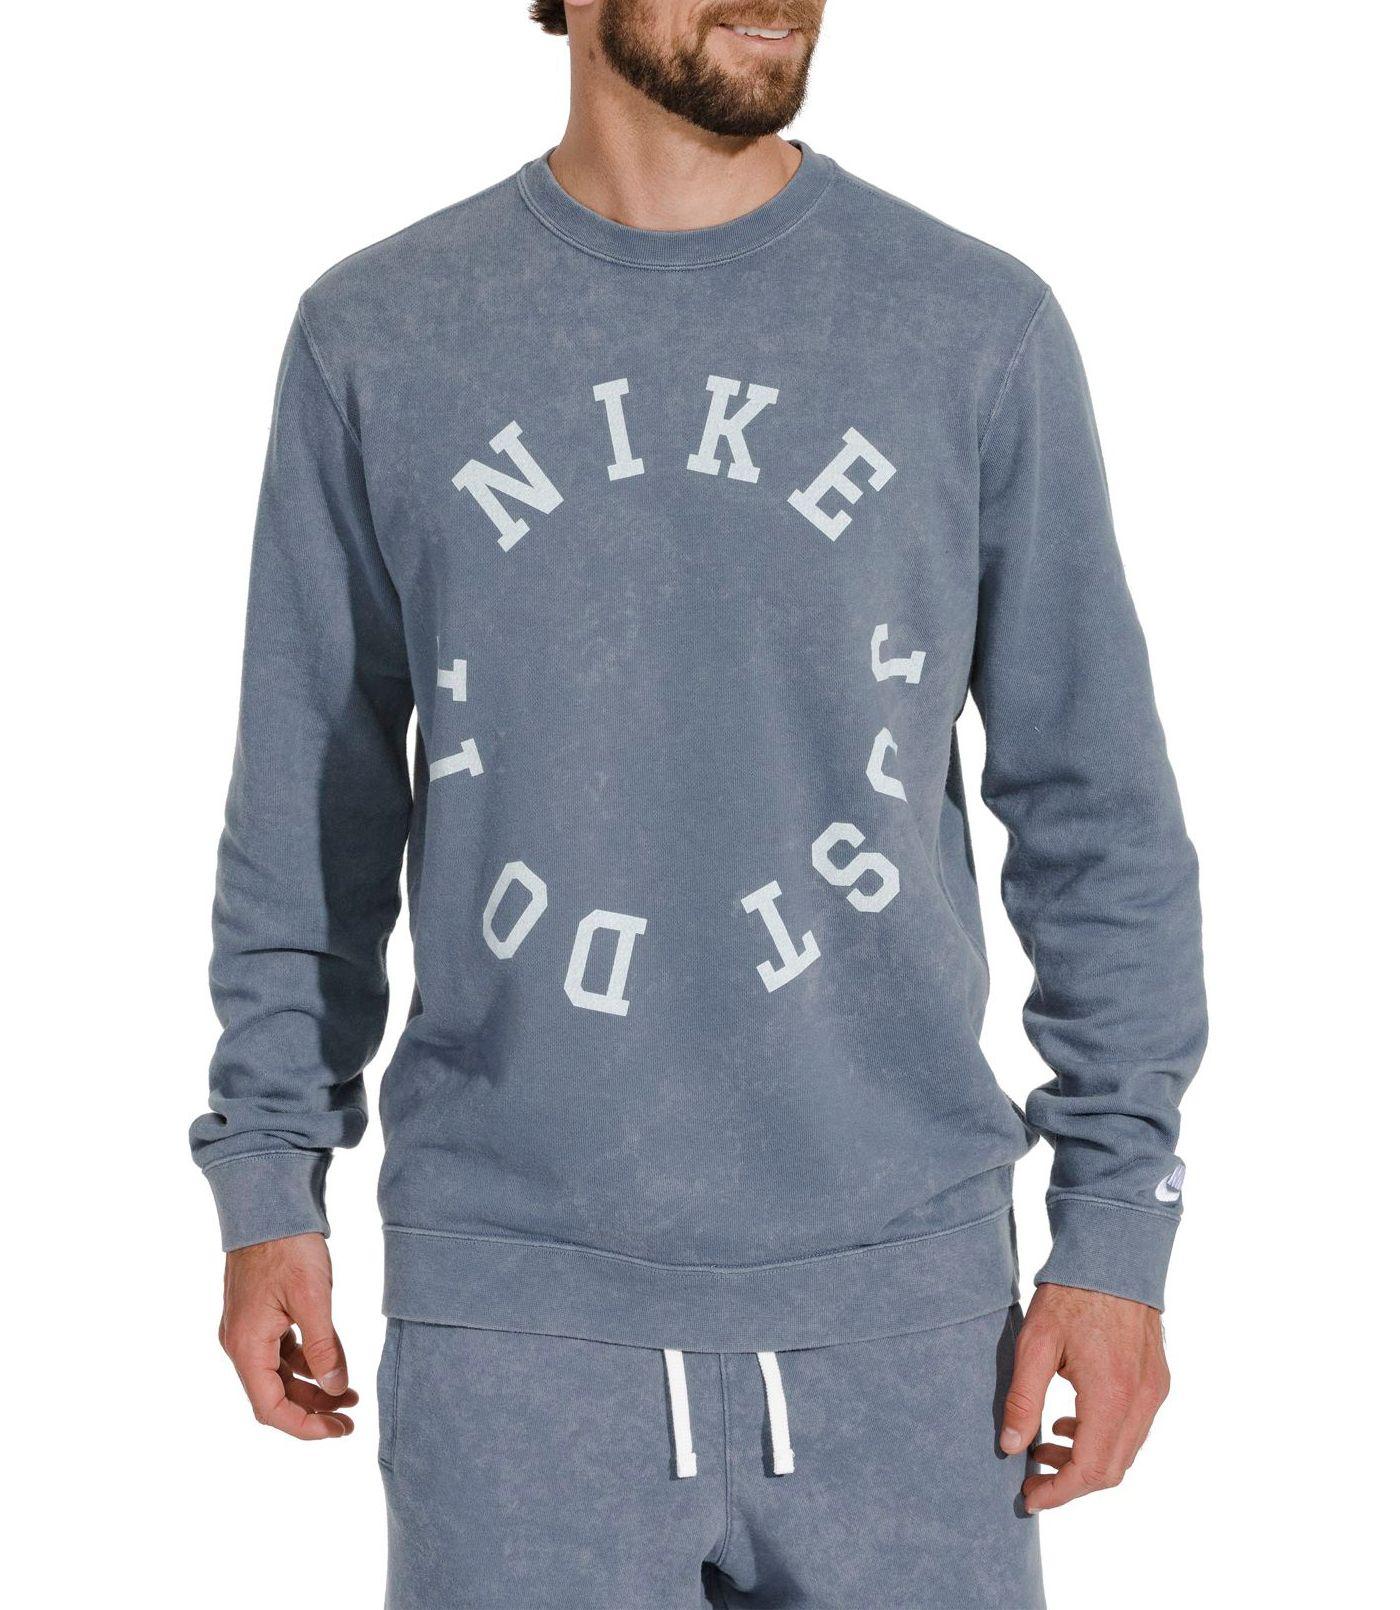 Nike Men's Sportswear French Terry Wash Long Sleeve Tee